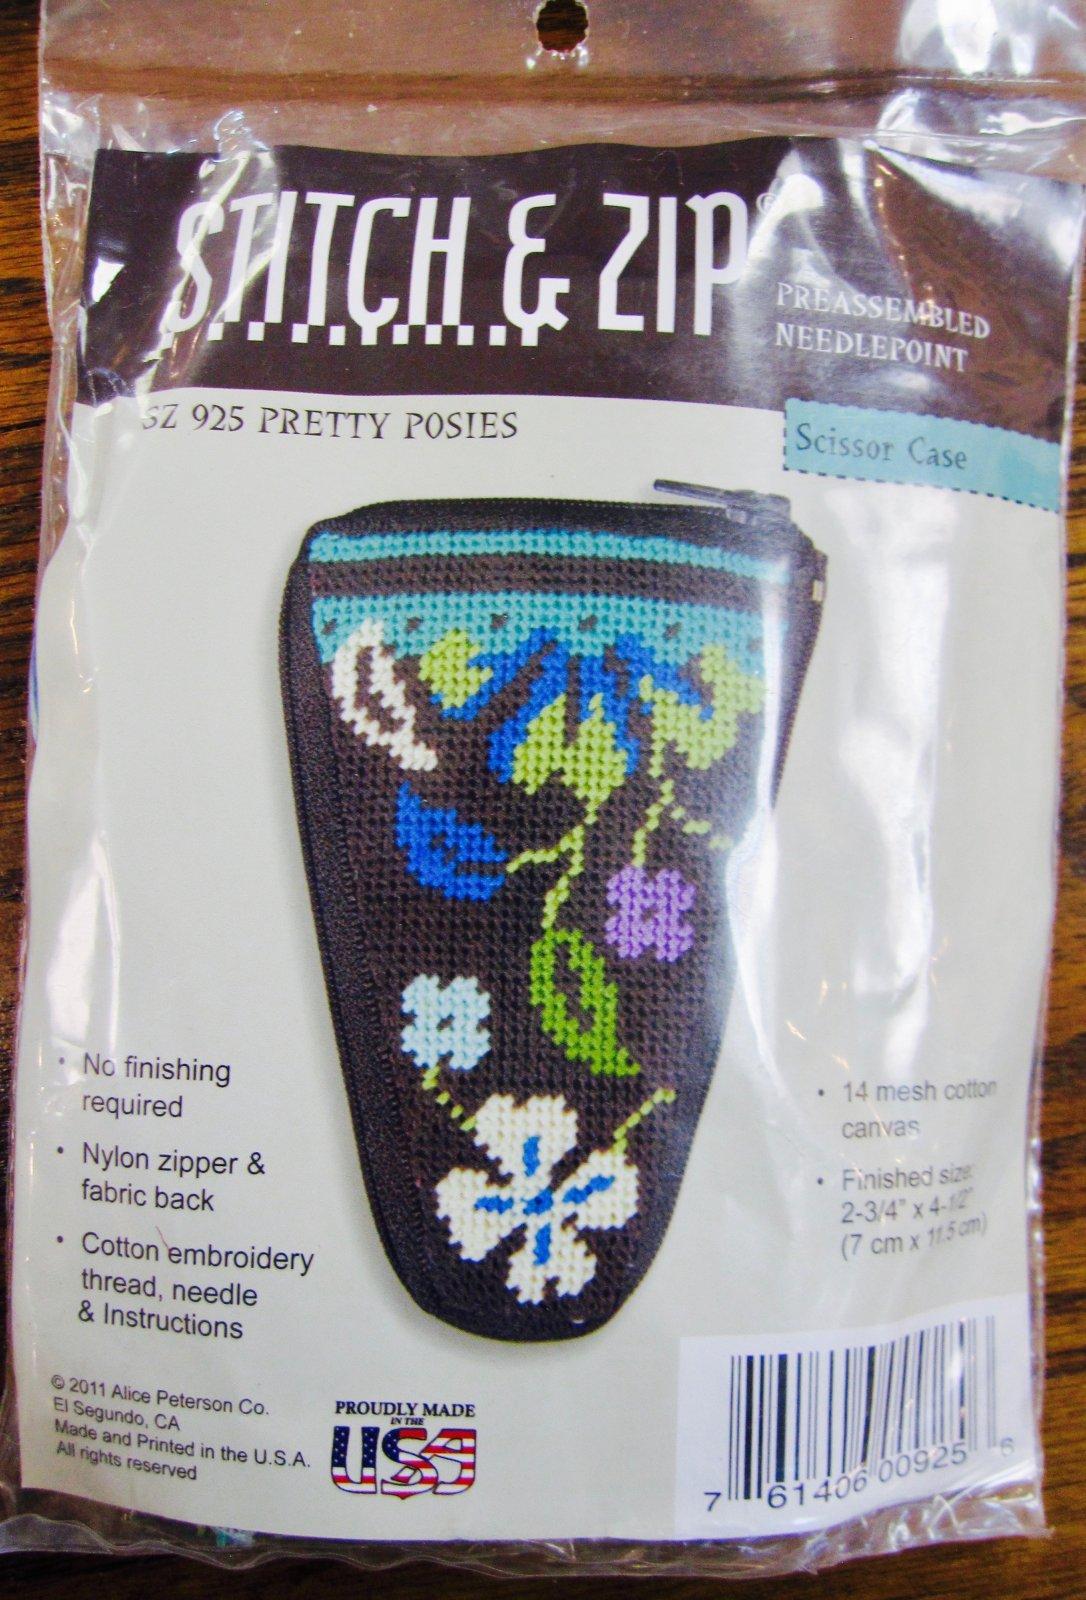 Pretty Posies Stitch & Zip scissor case